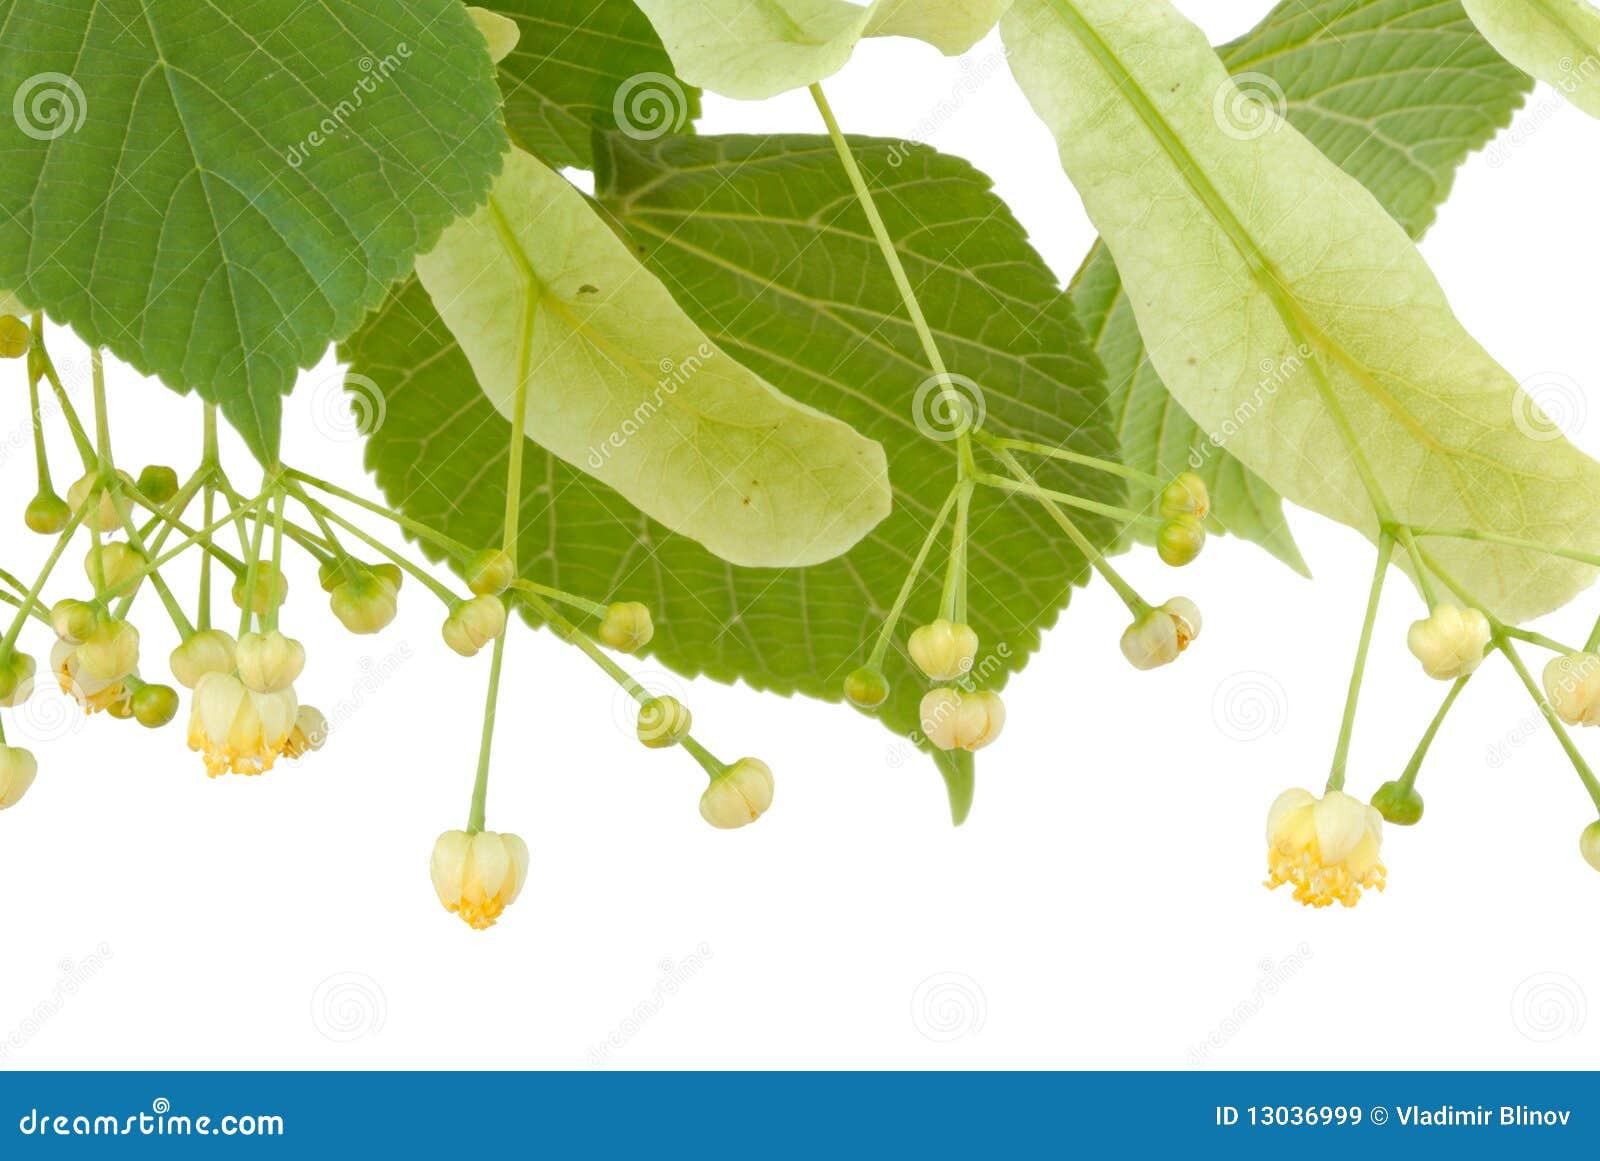 Linden Flower Royalty Free Stock Image